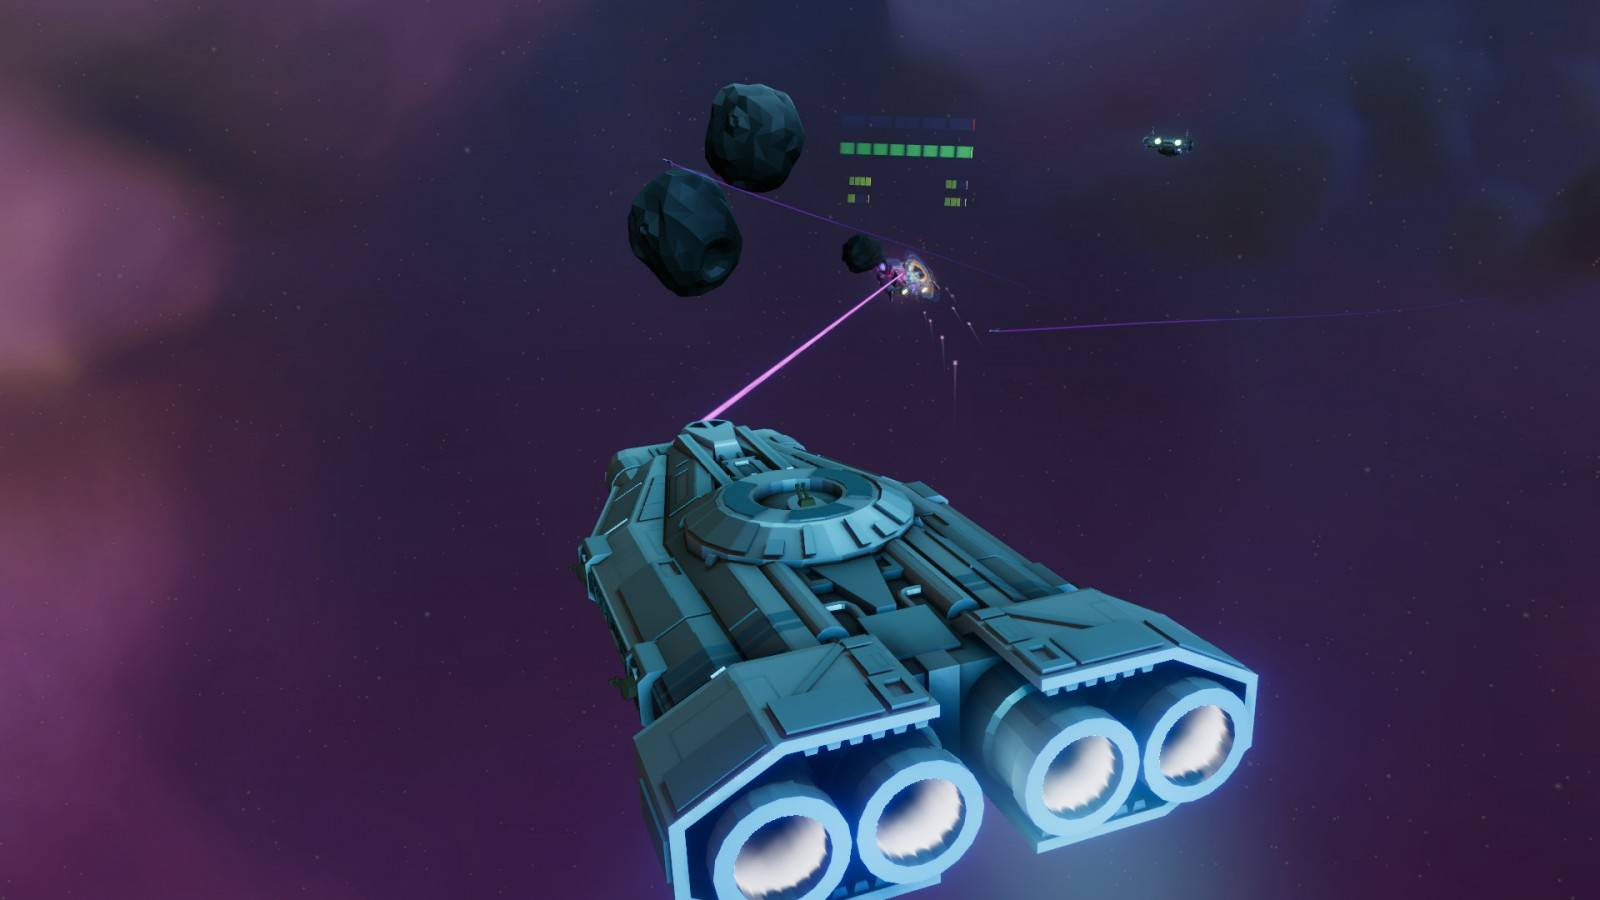 Eternal Starlight se estrena esta semana en Steam y Oculus 2